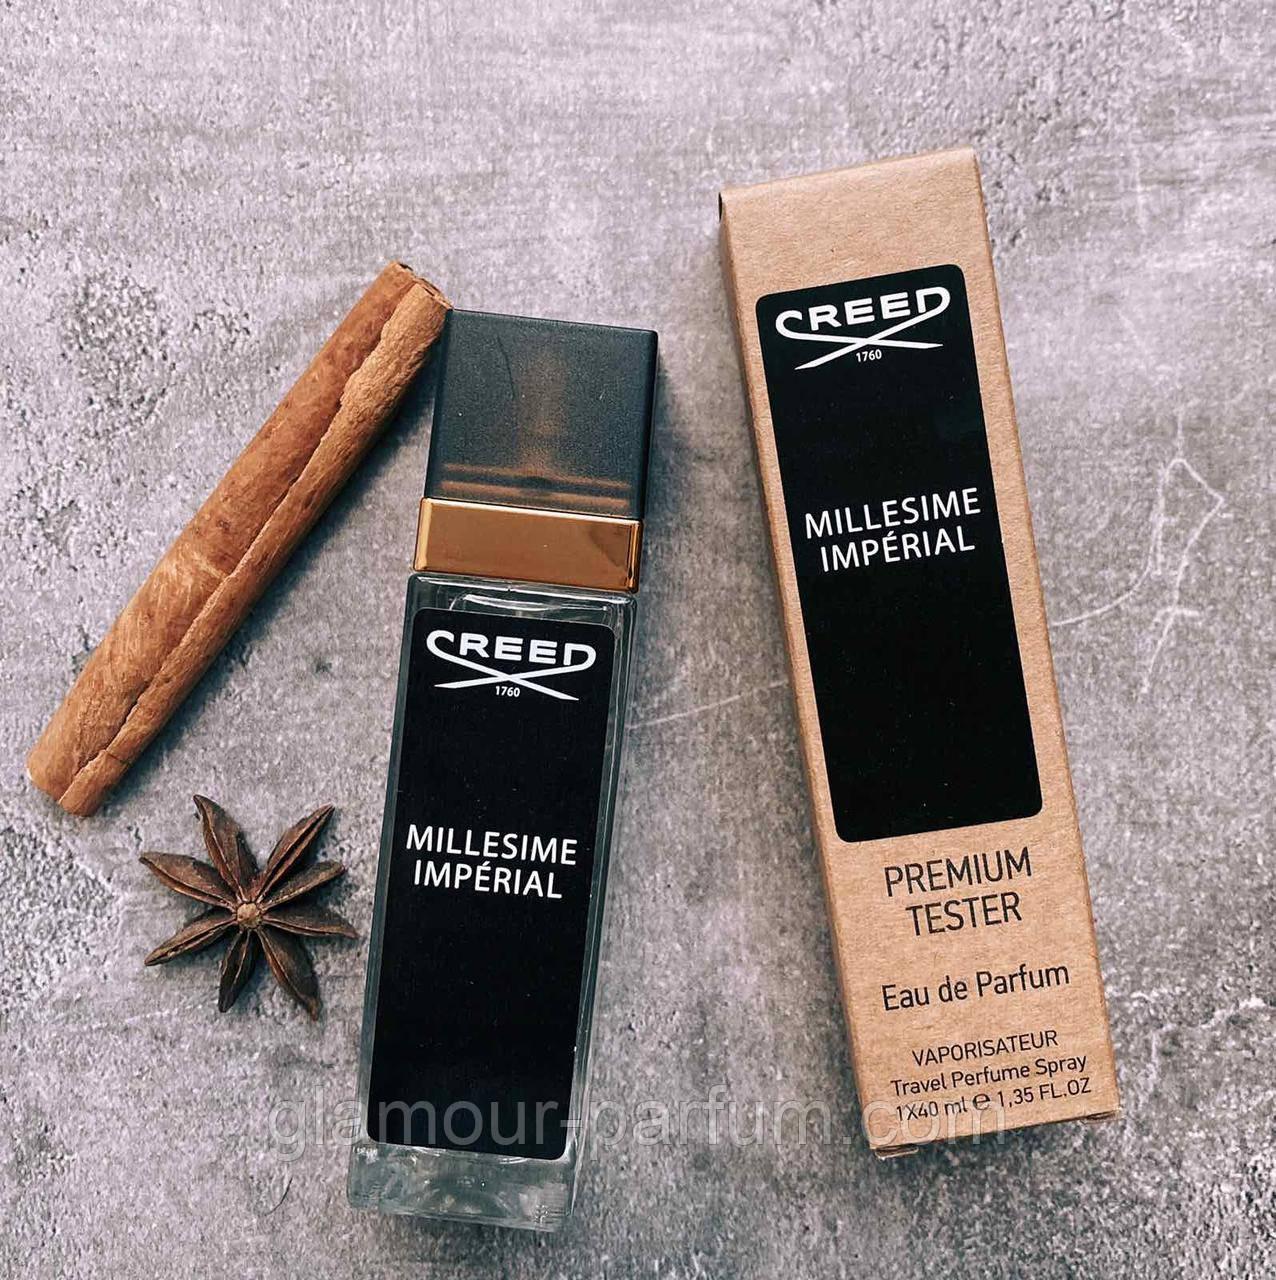 TESTER міні-парфуми Creed Milessime Imperial (Крід Миллисиме Імперіал) 40мл репліка ОПТ